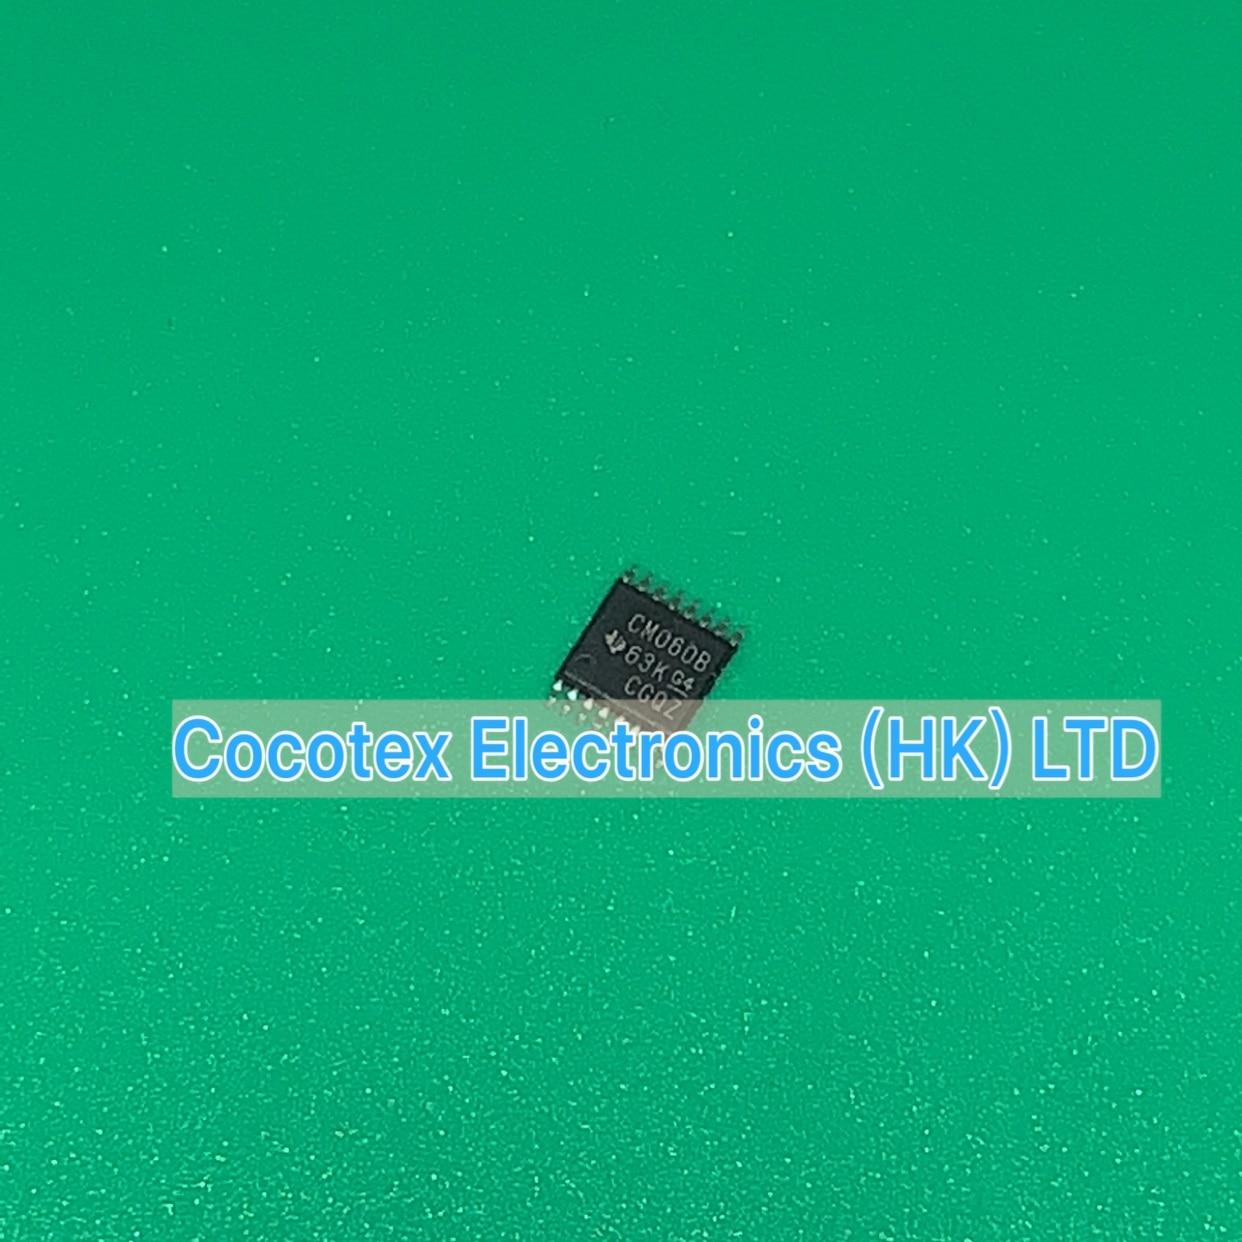 5 шт./лот CD4060BPWR TSSOP16 CM060B IC BNRY COUNTR/DIV 14STG 16TSSOP CM0608